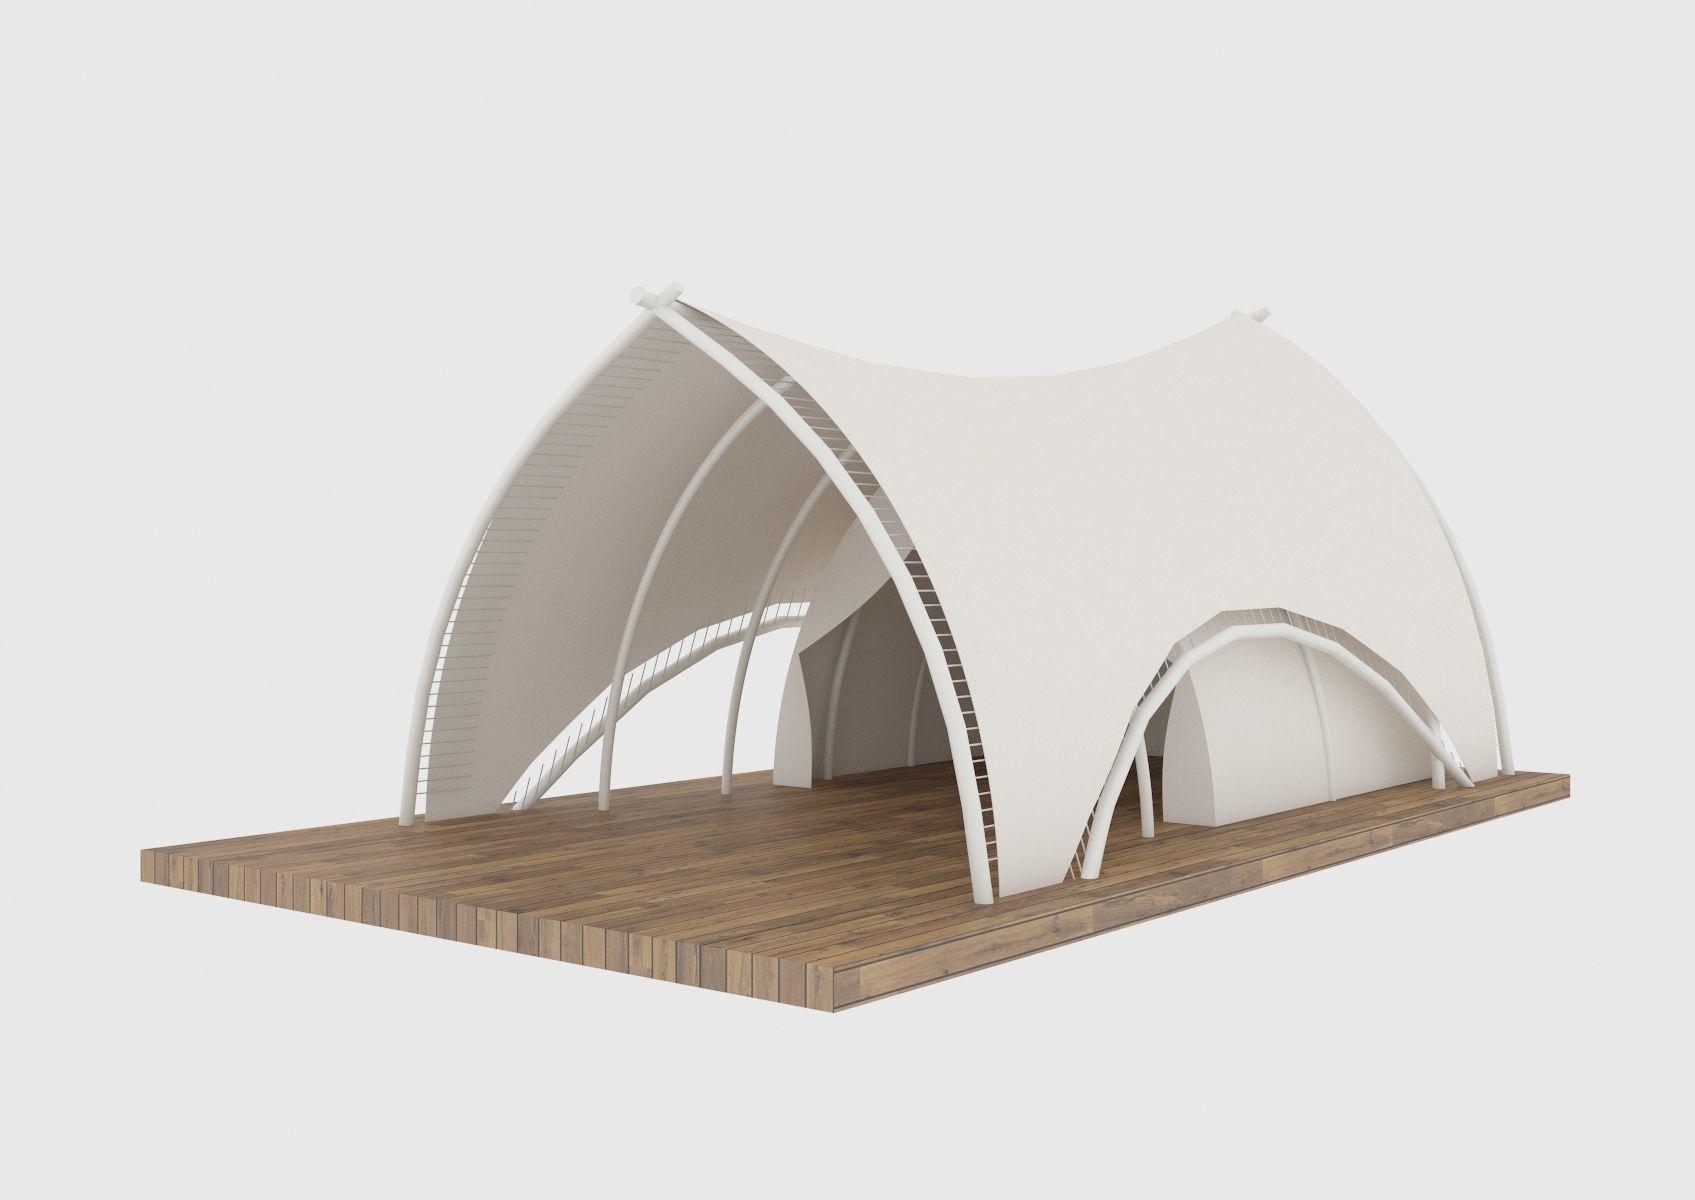 camping opera tent